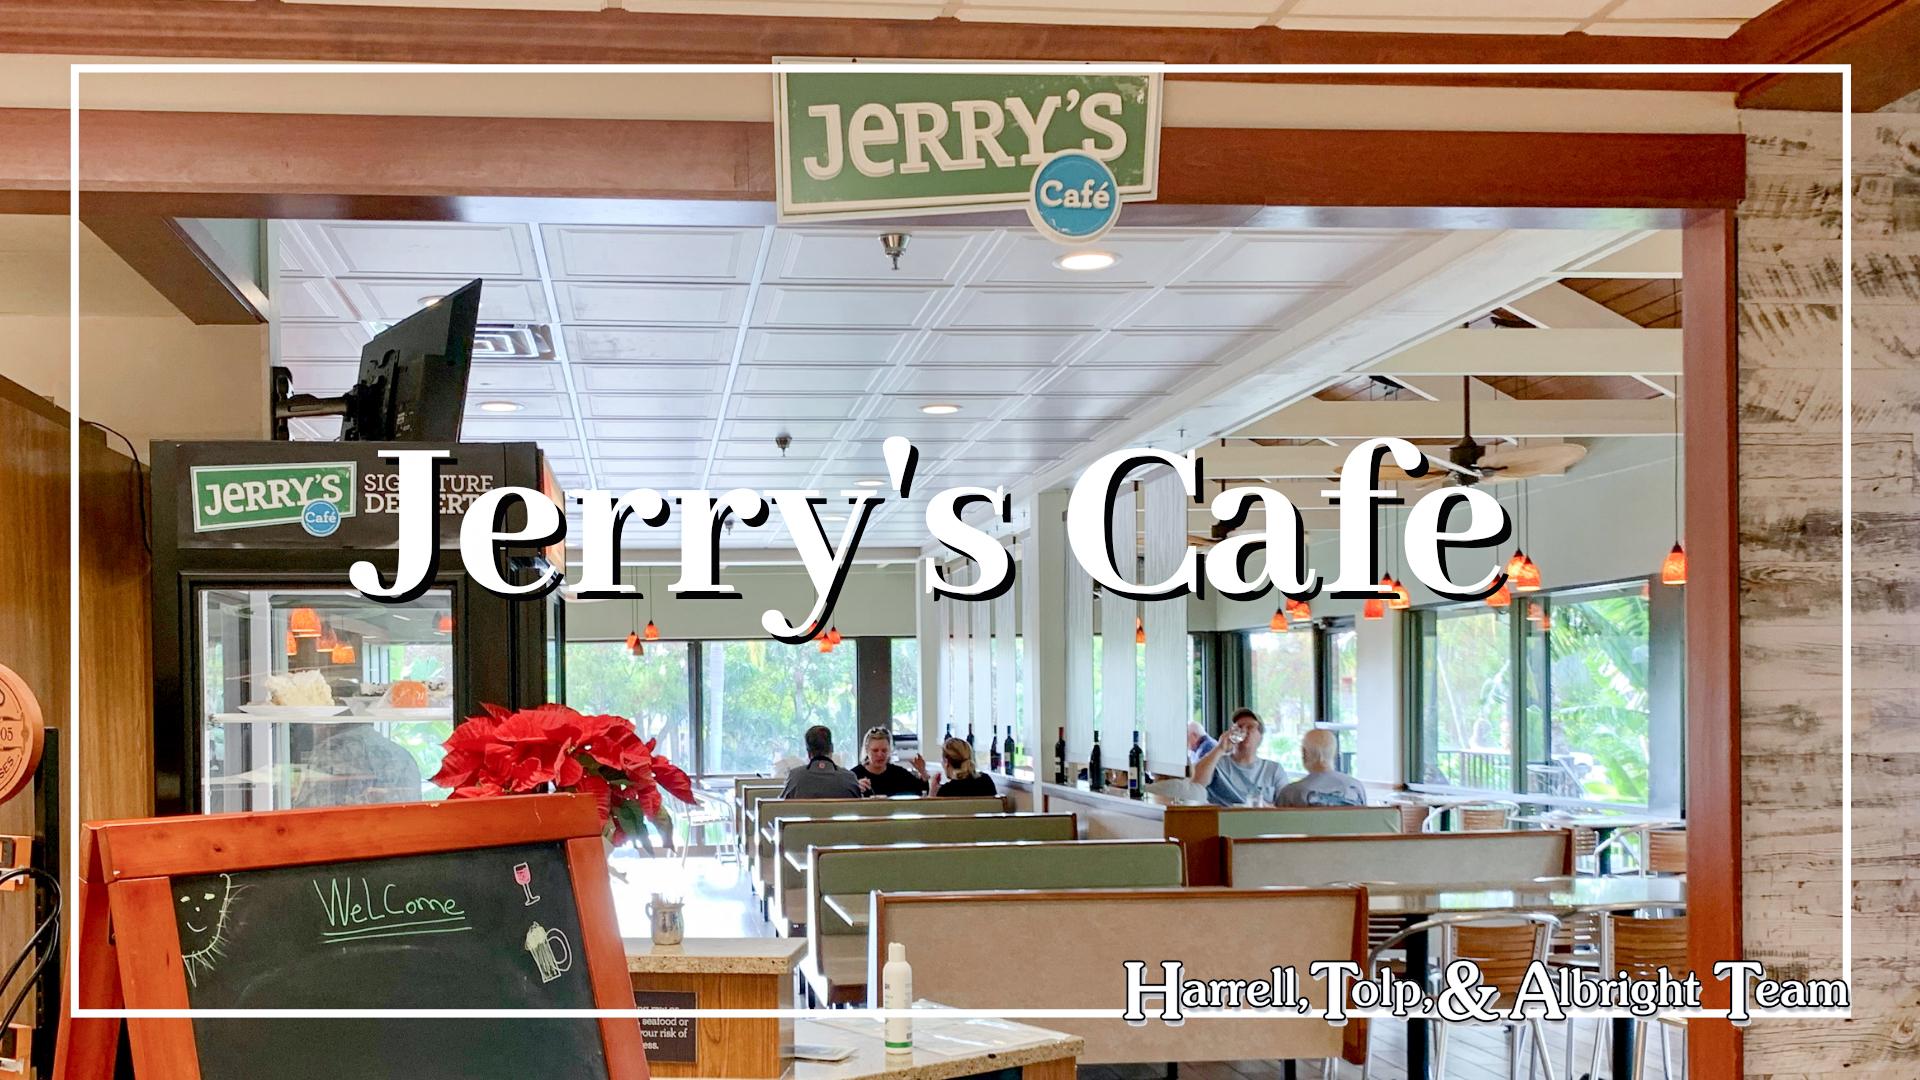 Jerry's Cafe Sanibel